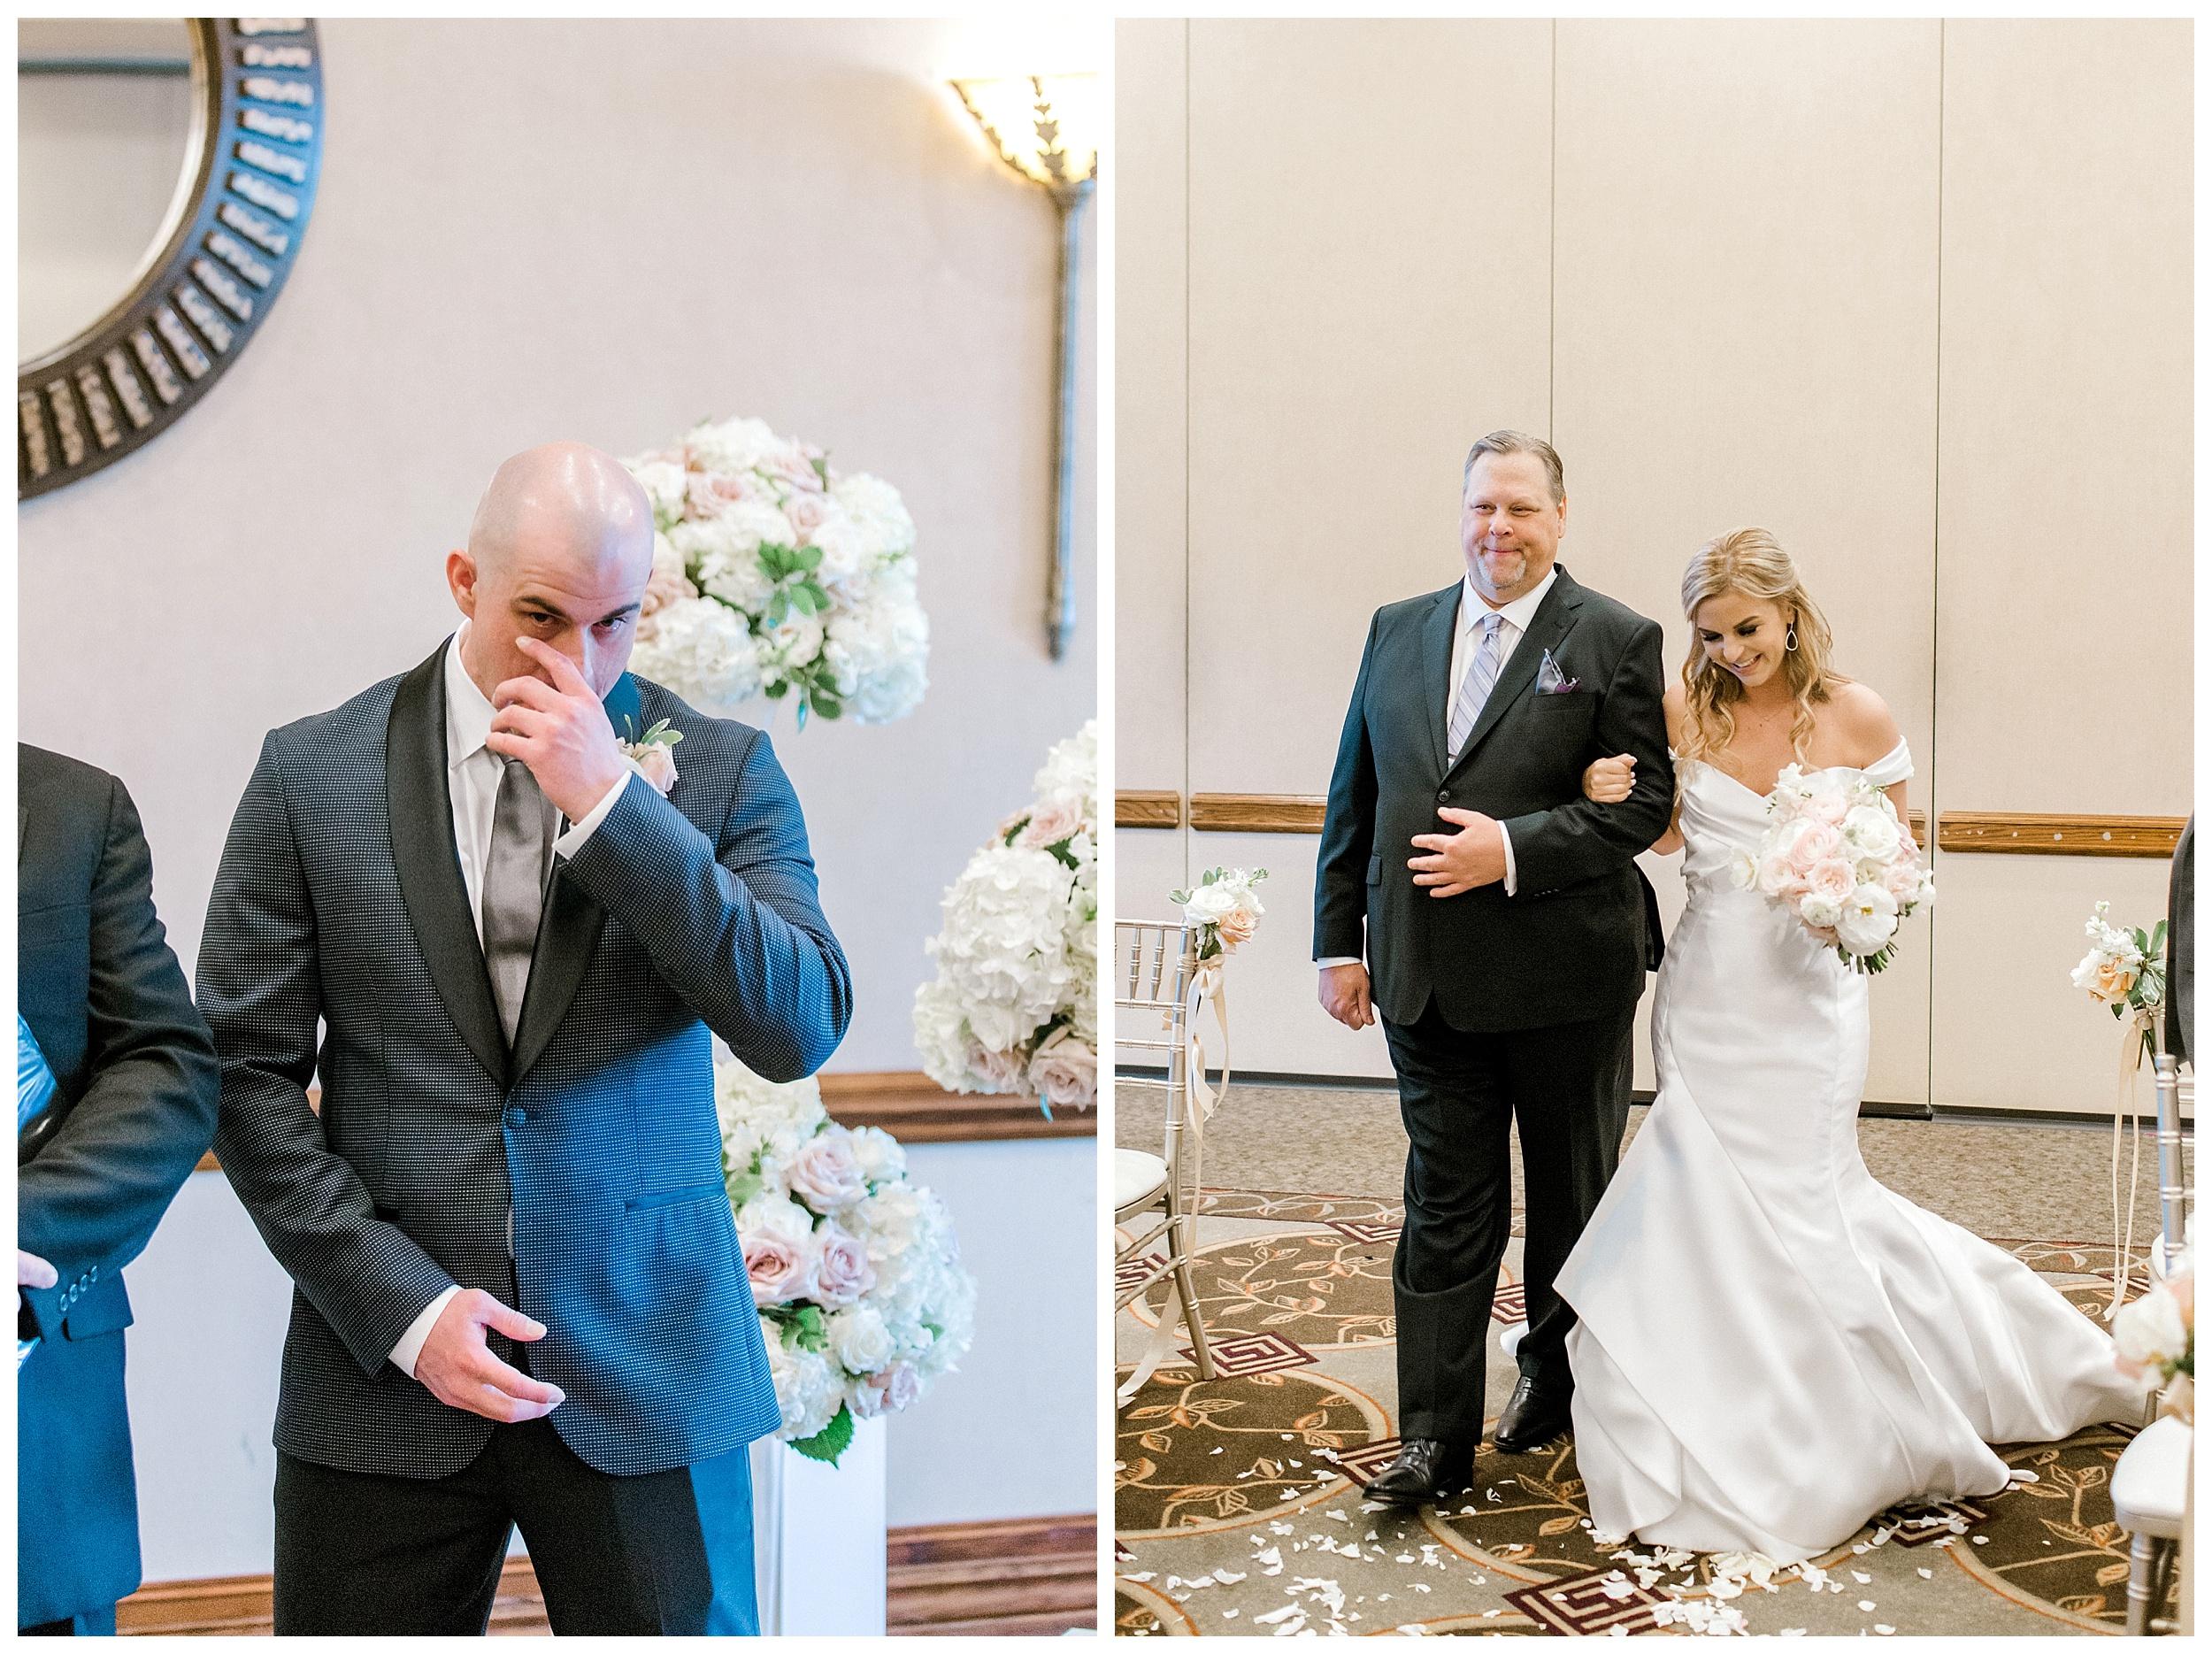 Lansdowne Resort Wedding | Virginia Film Wedding Photographer Kir Tuben_0055.jpg